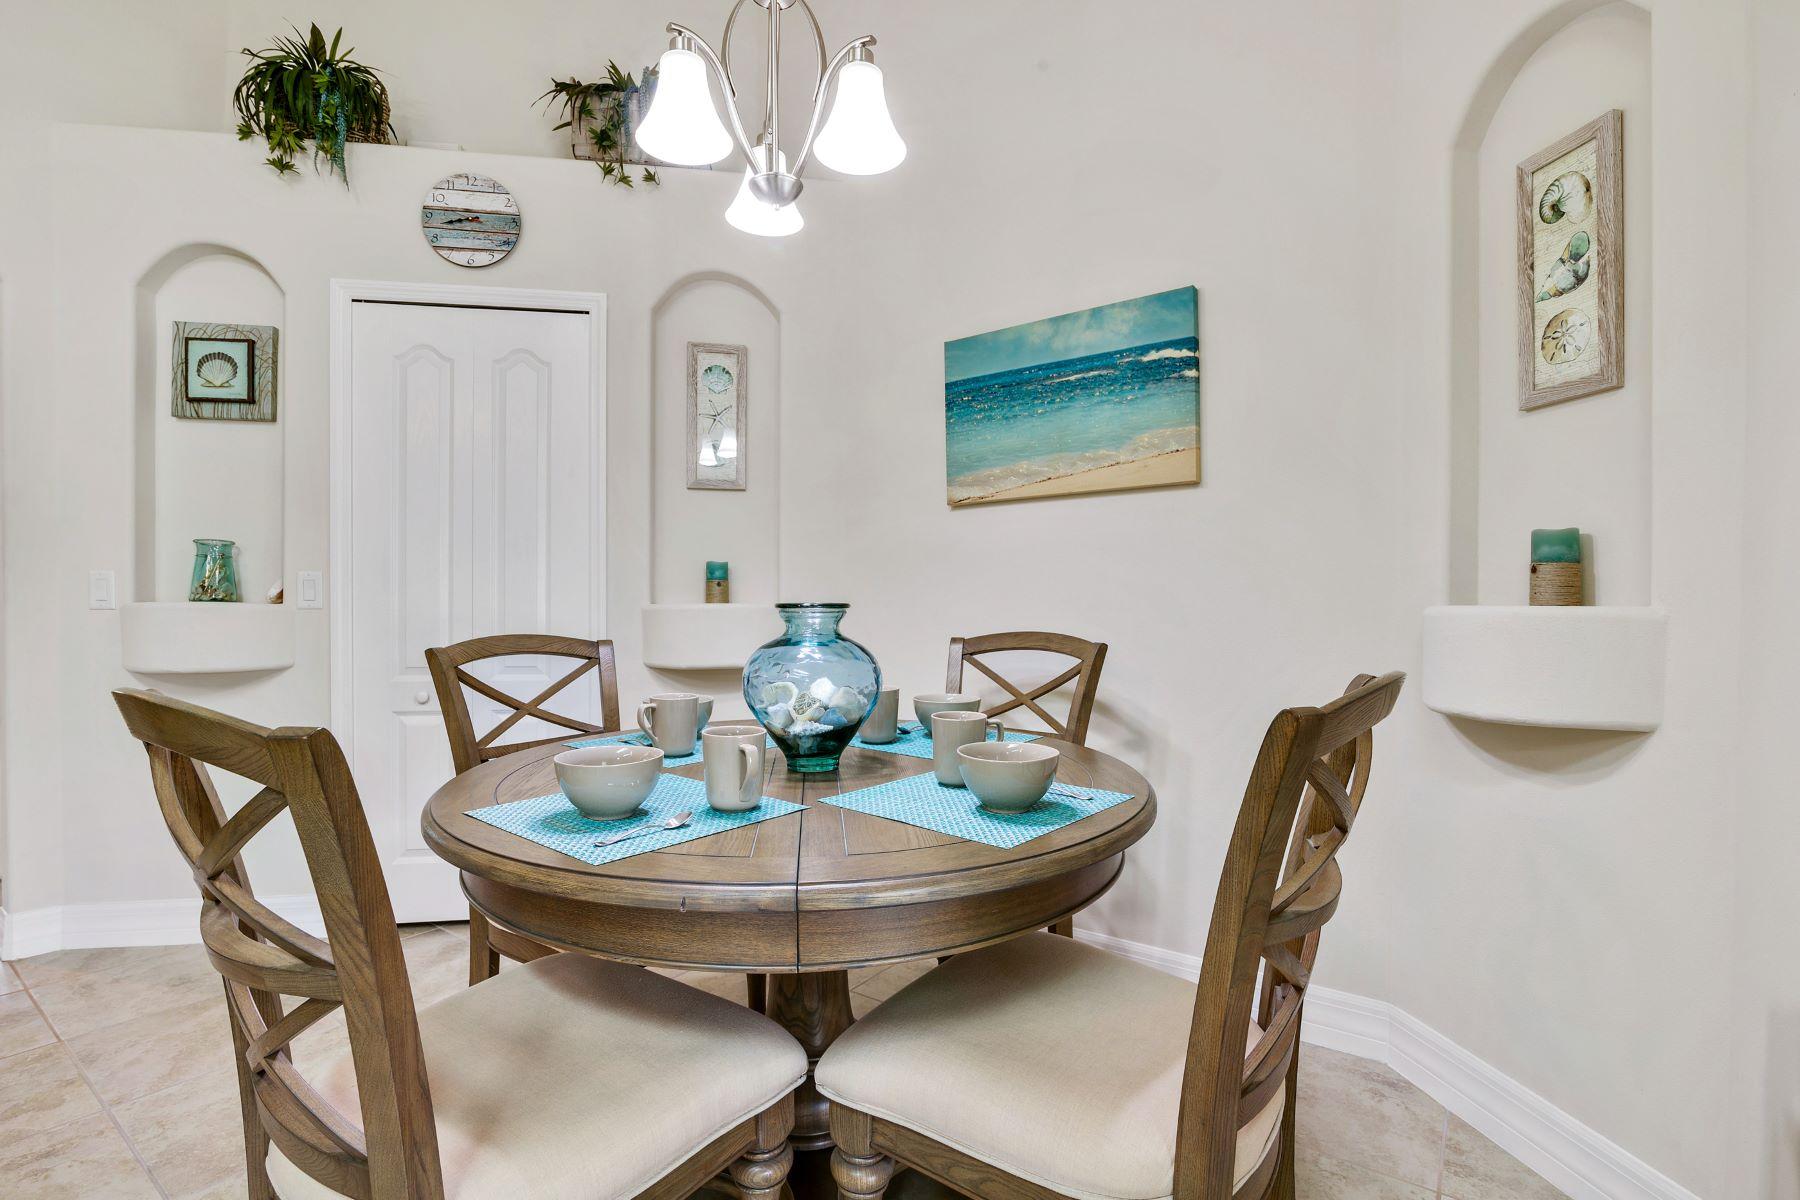 Single Family Home for Sale at Eau Gallie Shores 545 Jackson Avenue Satellite Beach, Florida 32937 United States